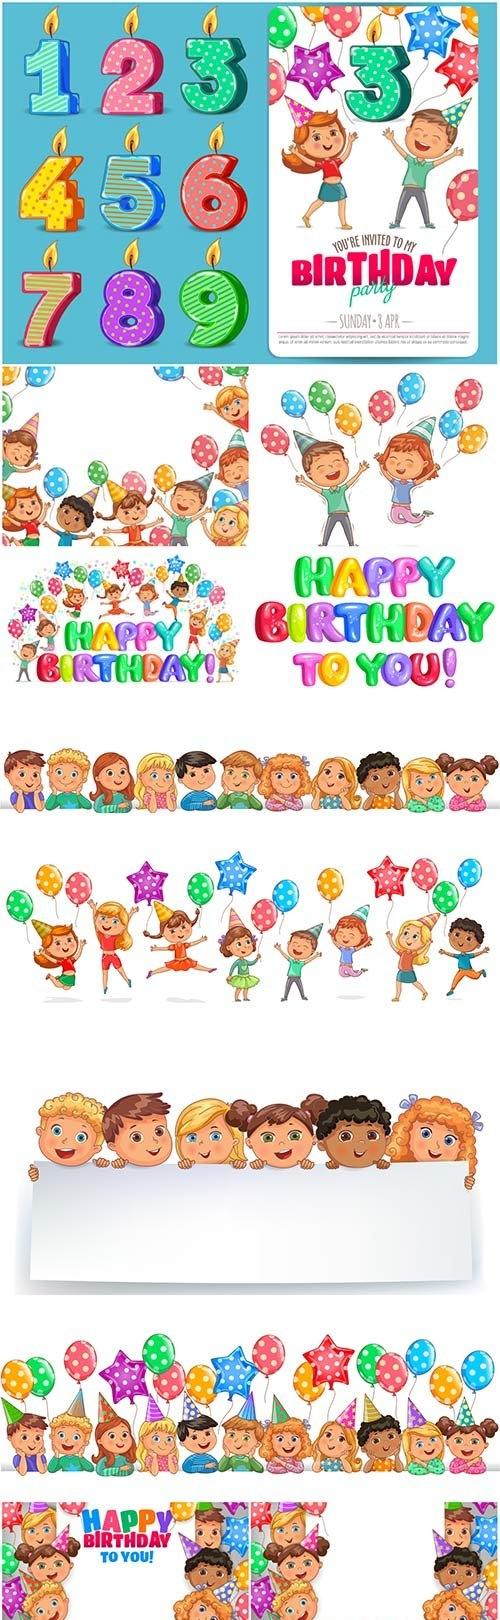 Happy birthday vector illustration, funny kids